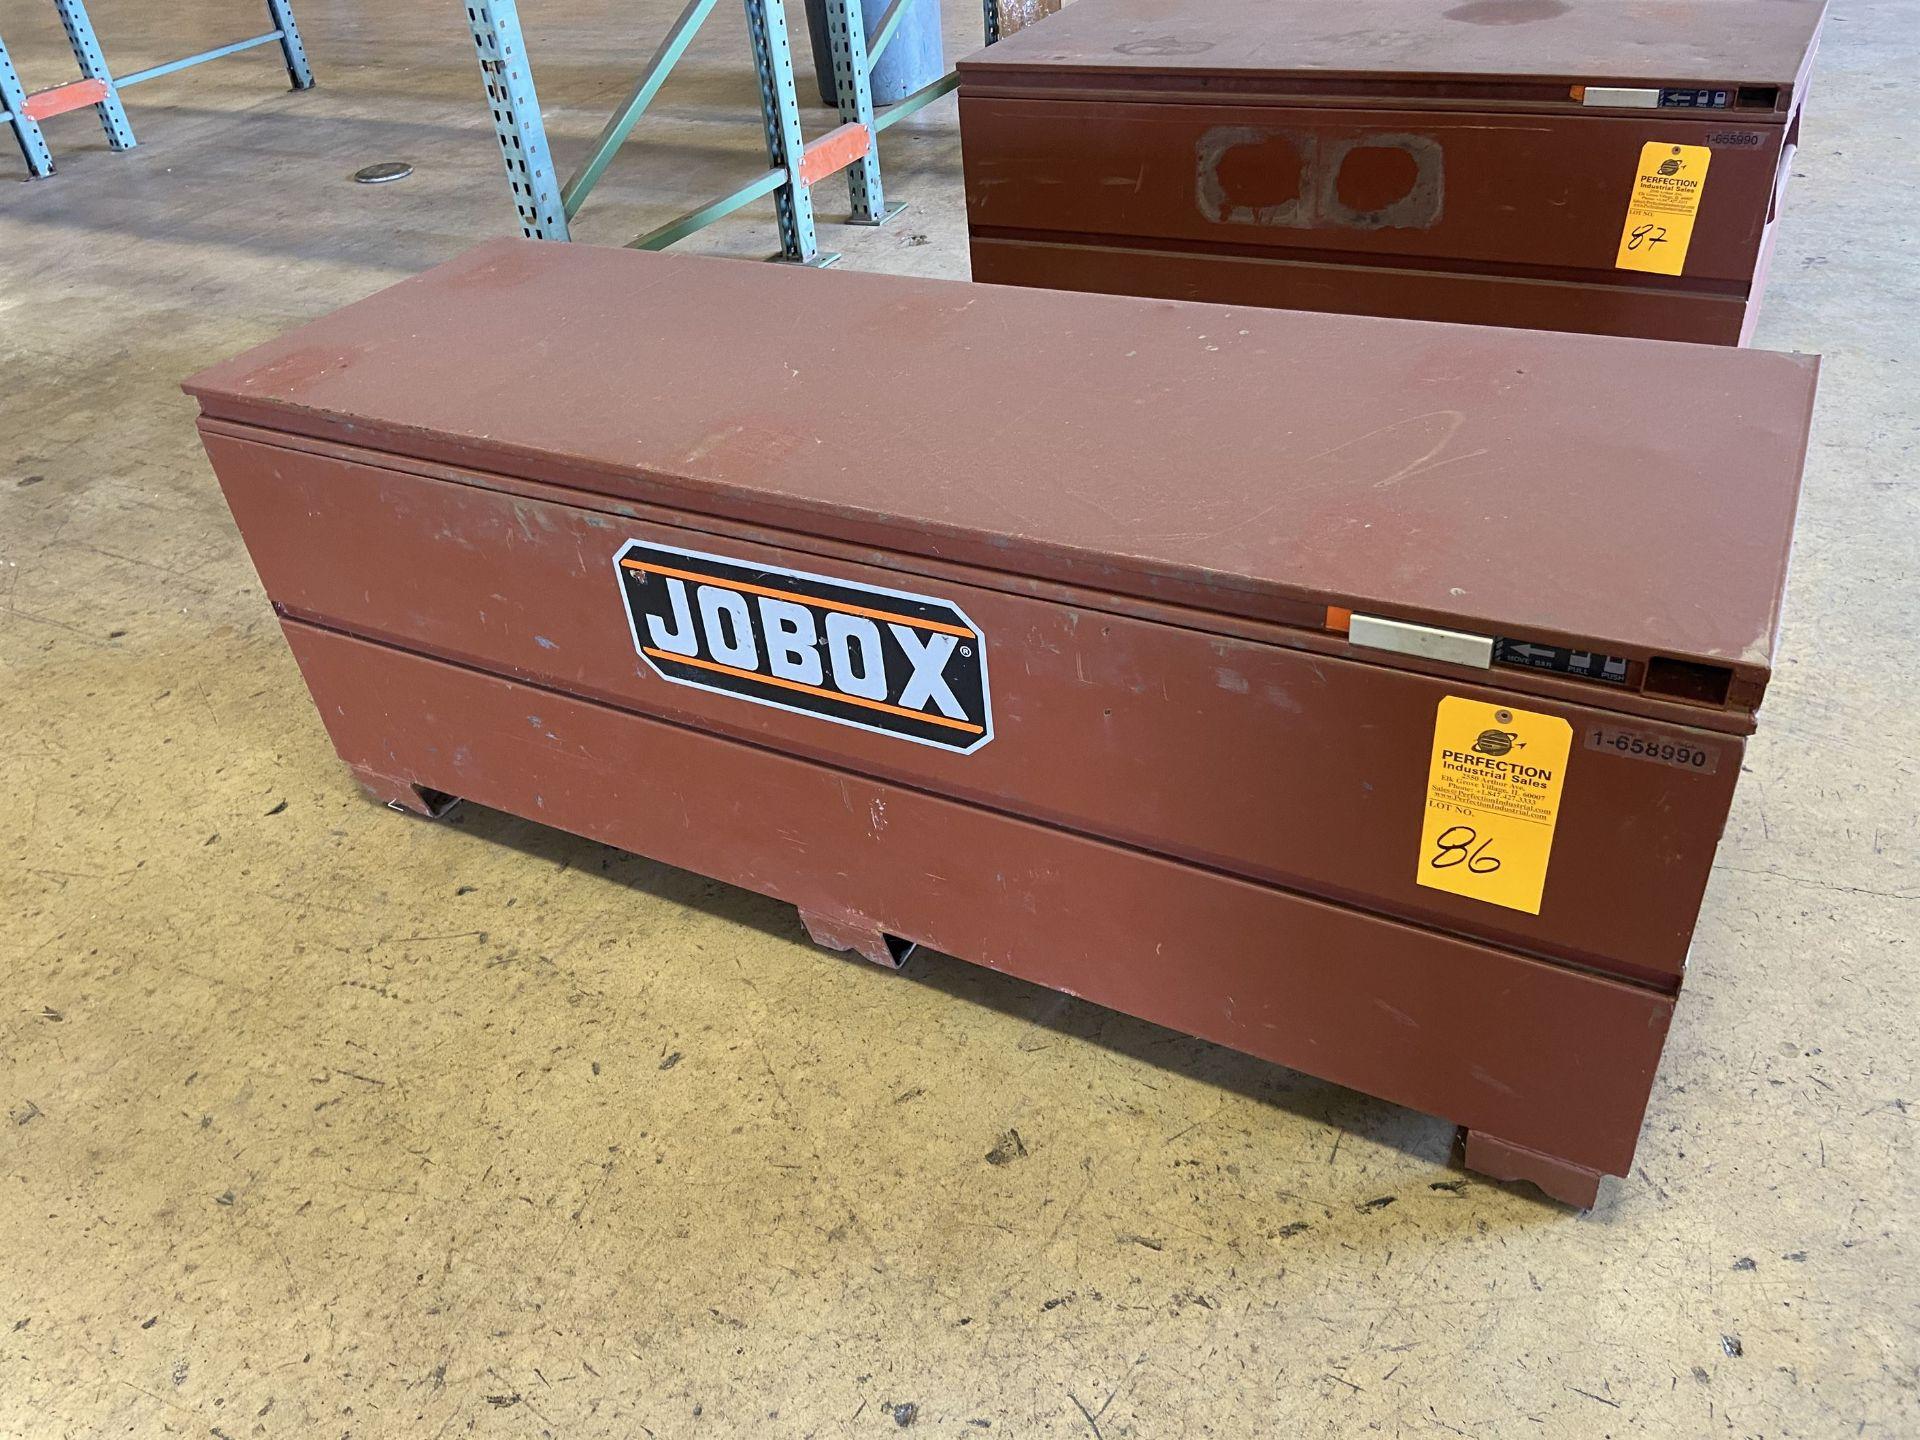 Jobox Model 1-658990